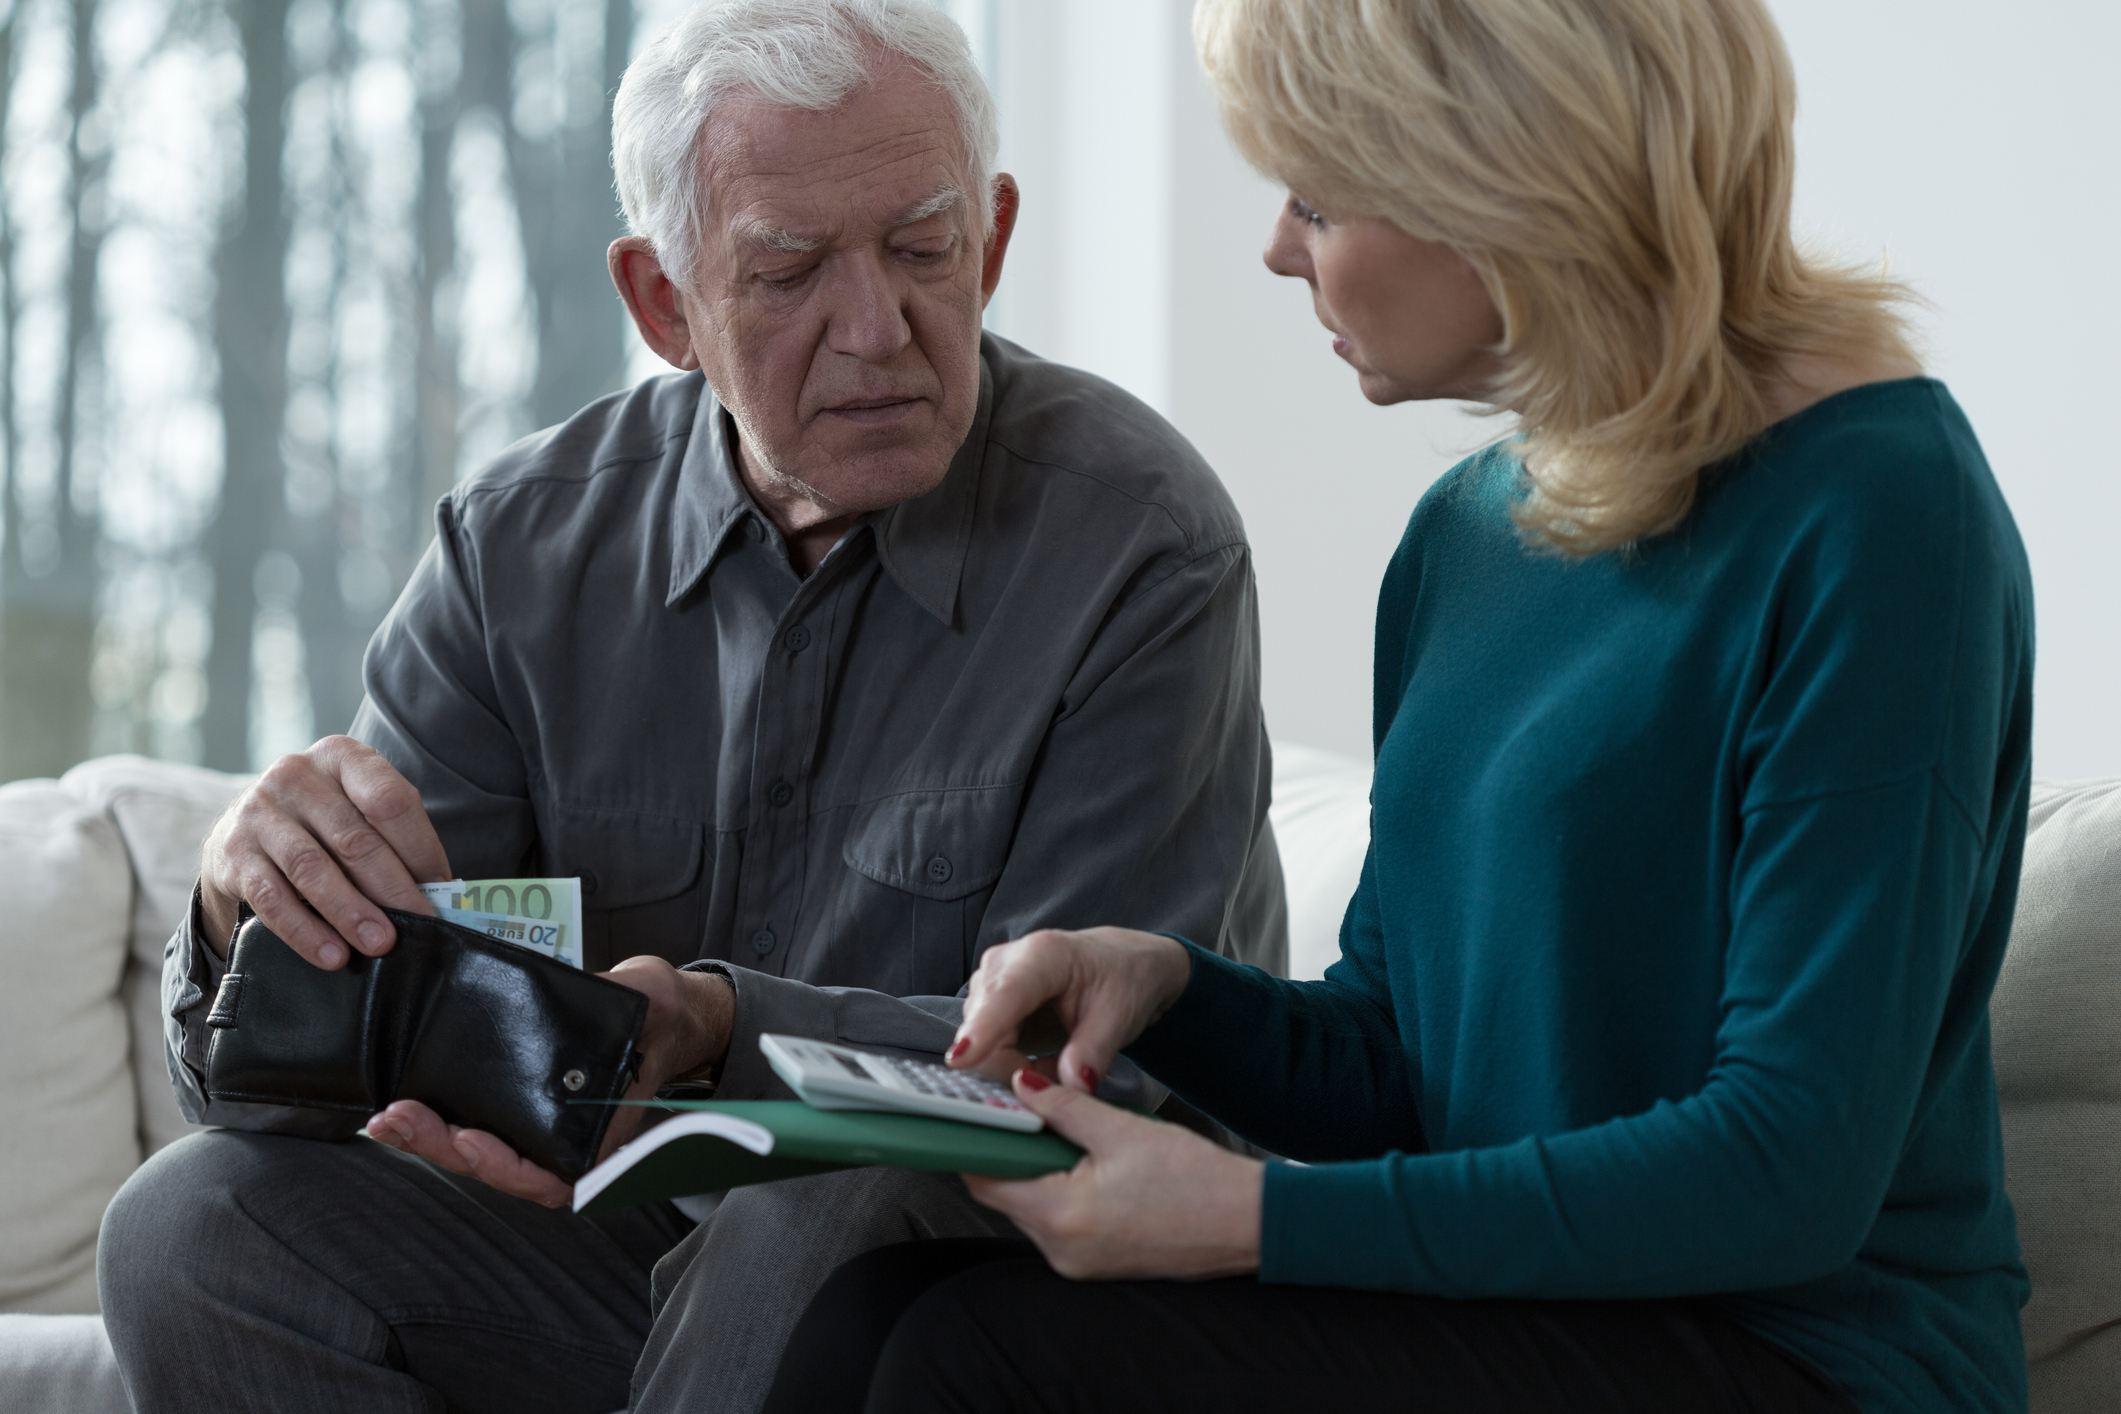 orlando senior living costs